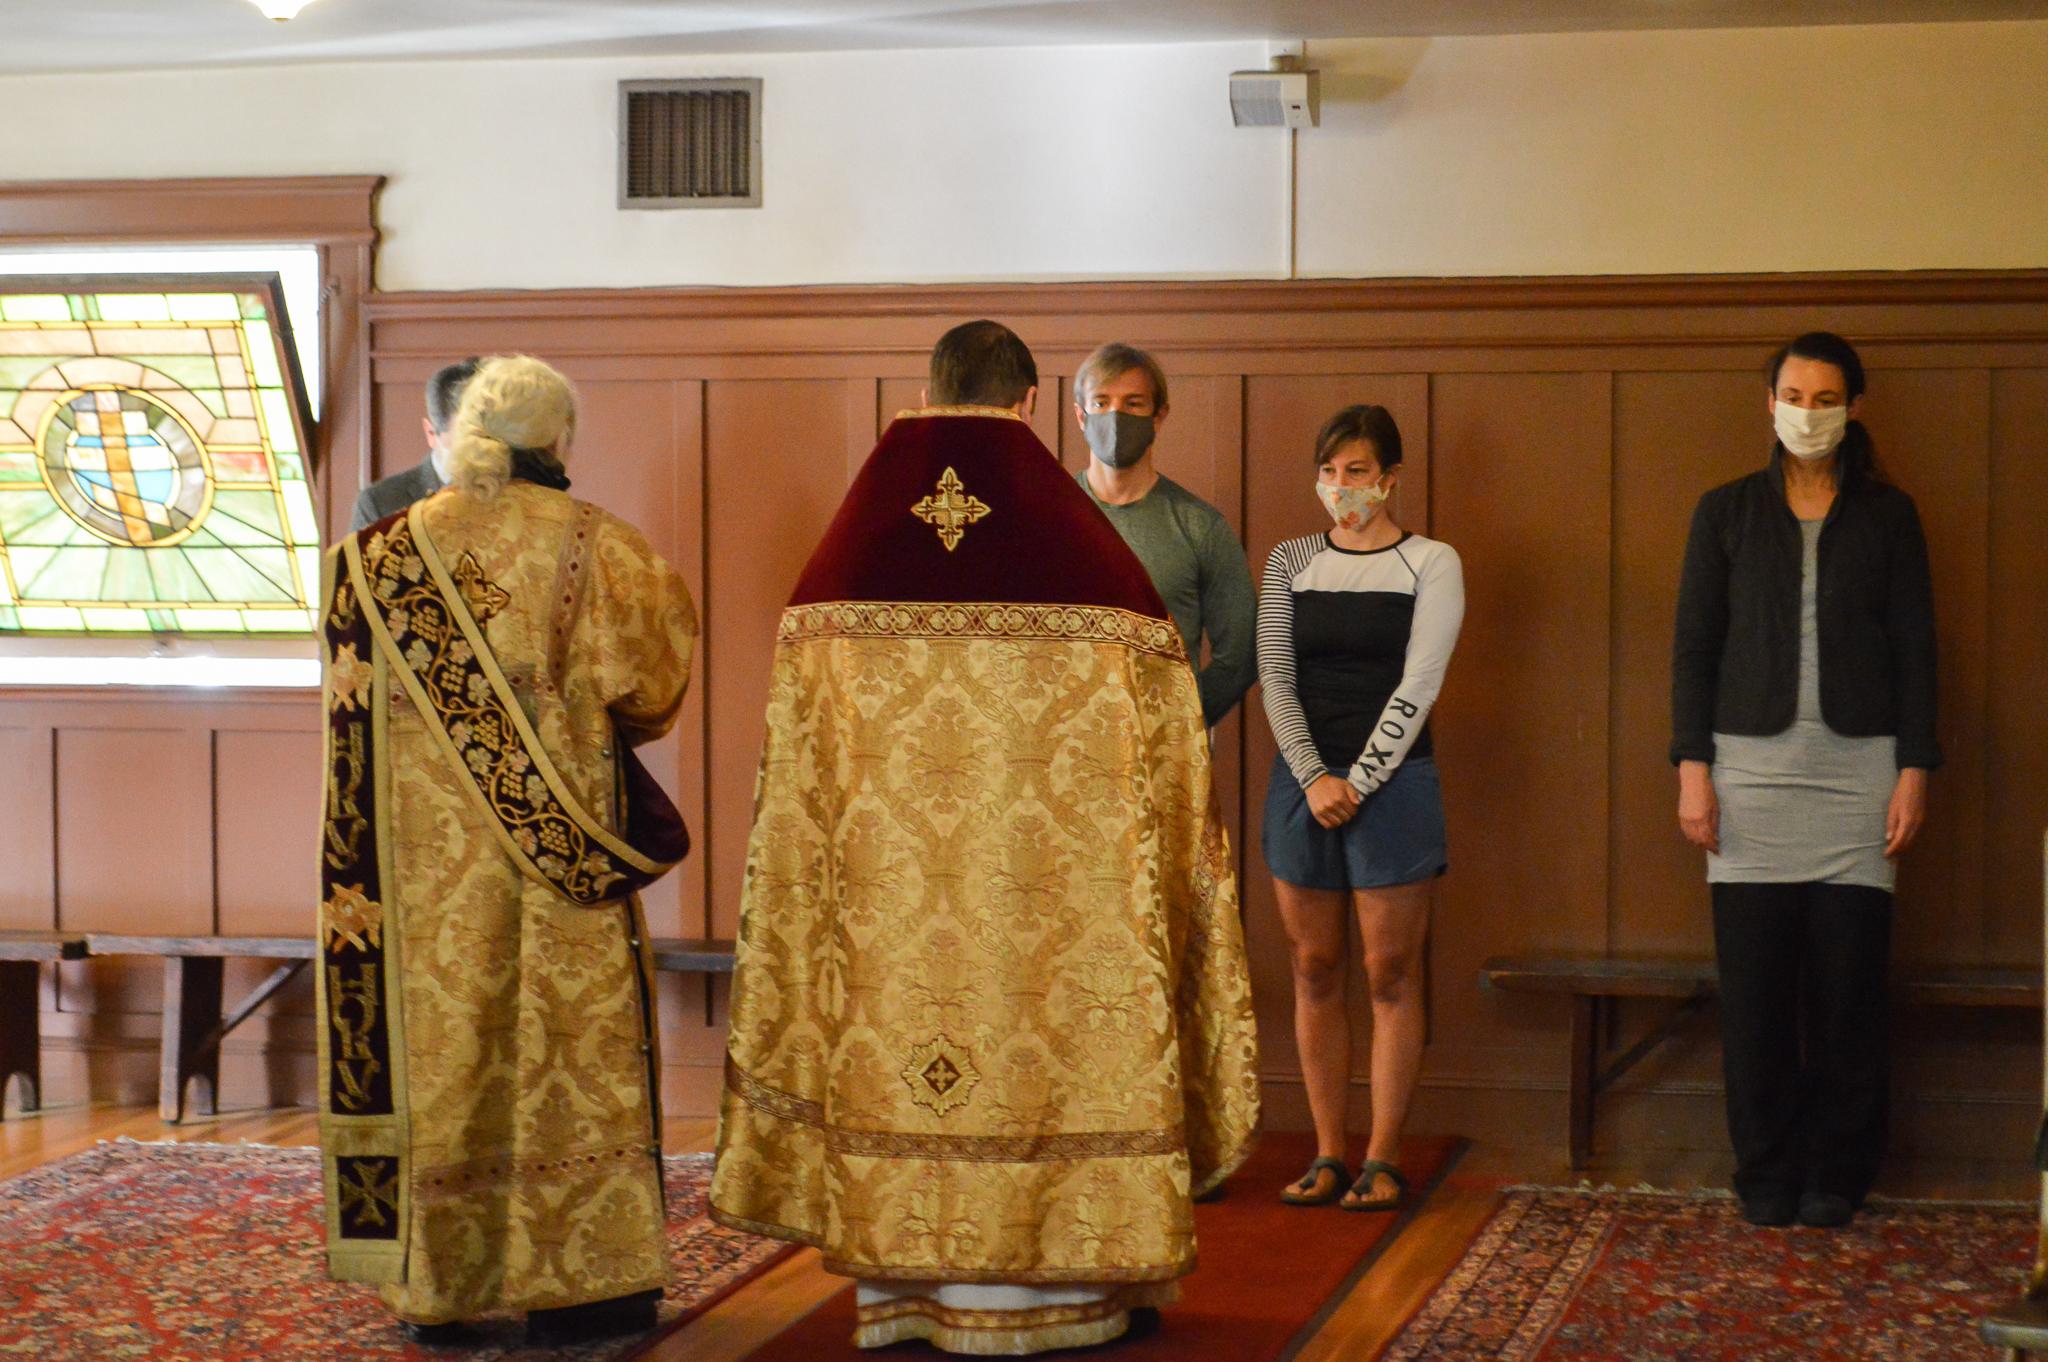 John-and-Alexandra-Baptism-Feb28-5